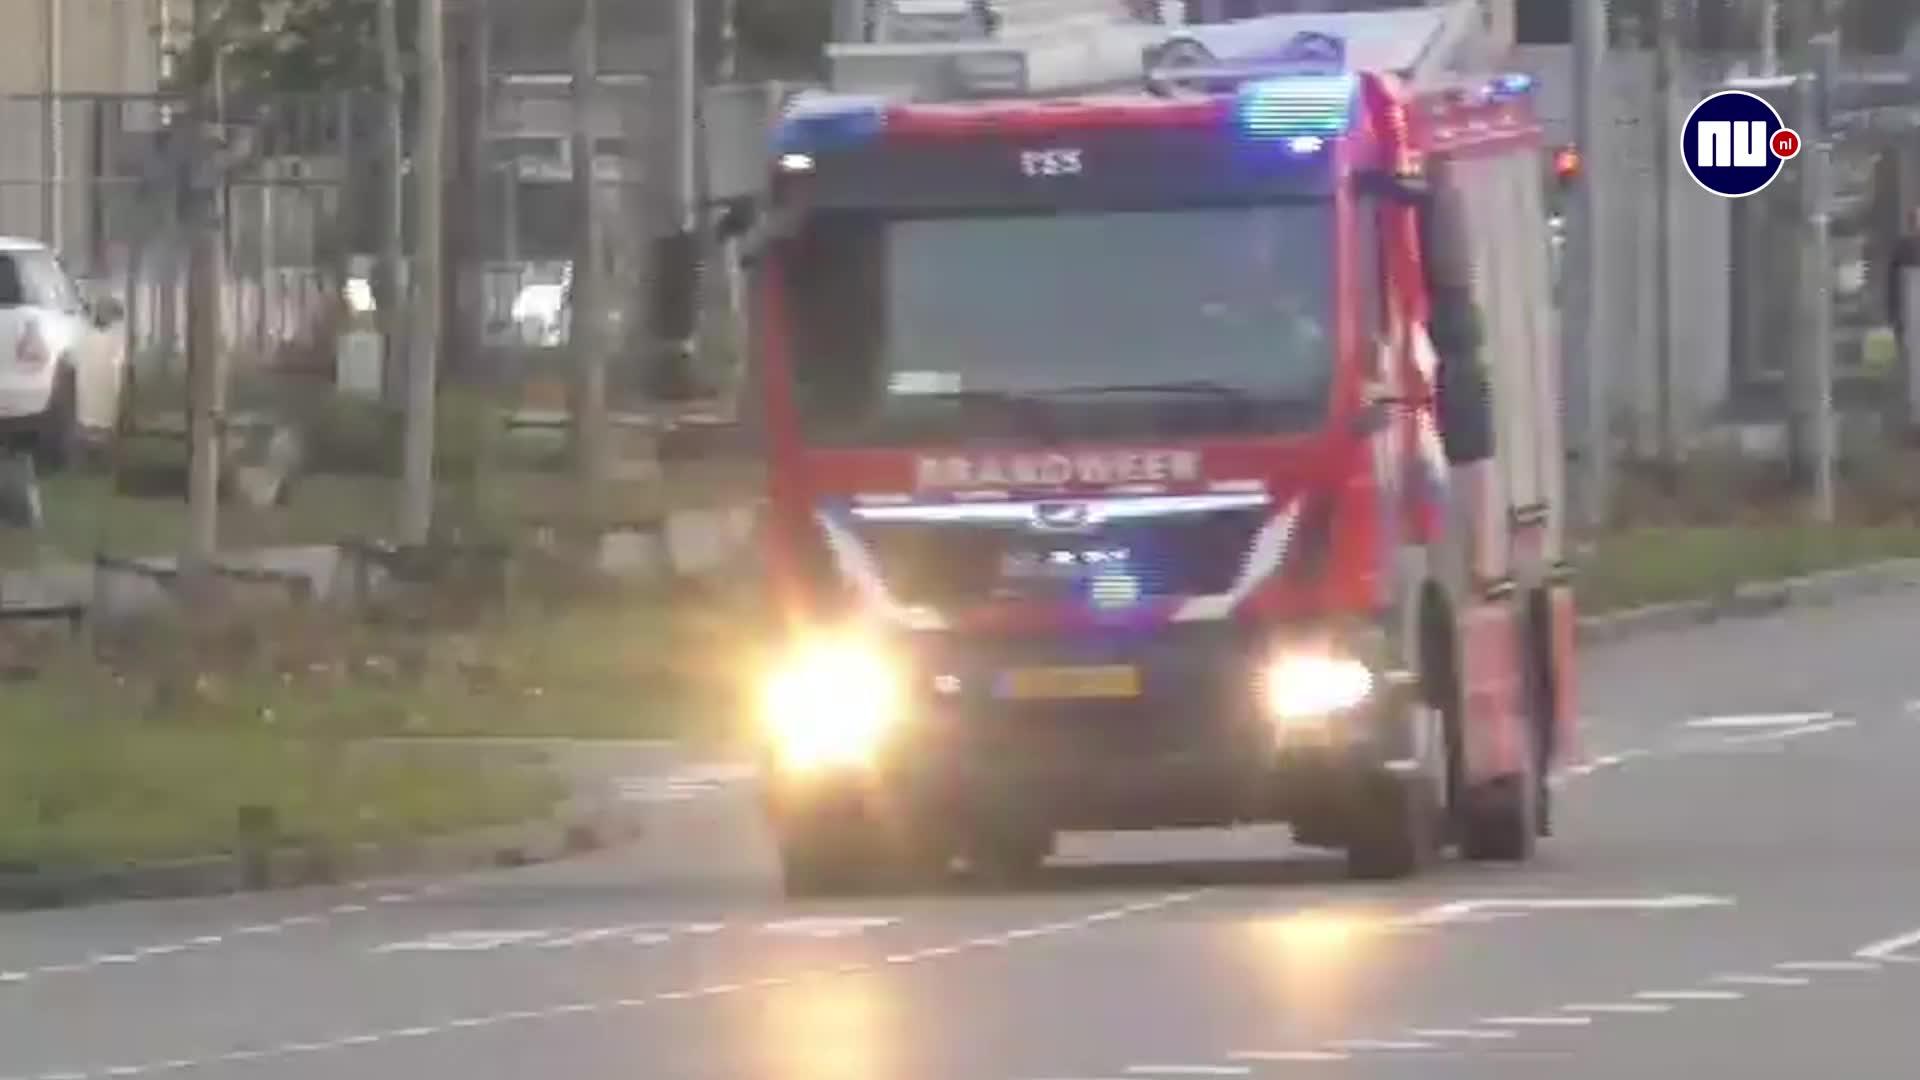 crash accident, engine, fire, groningen, netherlands, reddit, roadcam, truck, 2 cars T-bone a firetruck in Groningen (NL) GIFs